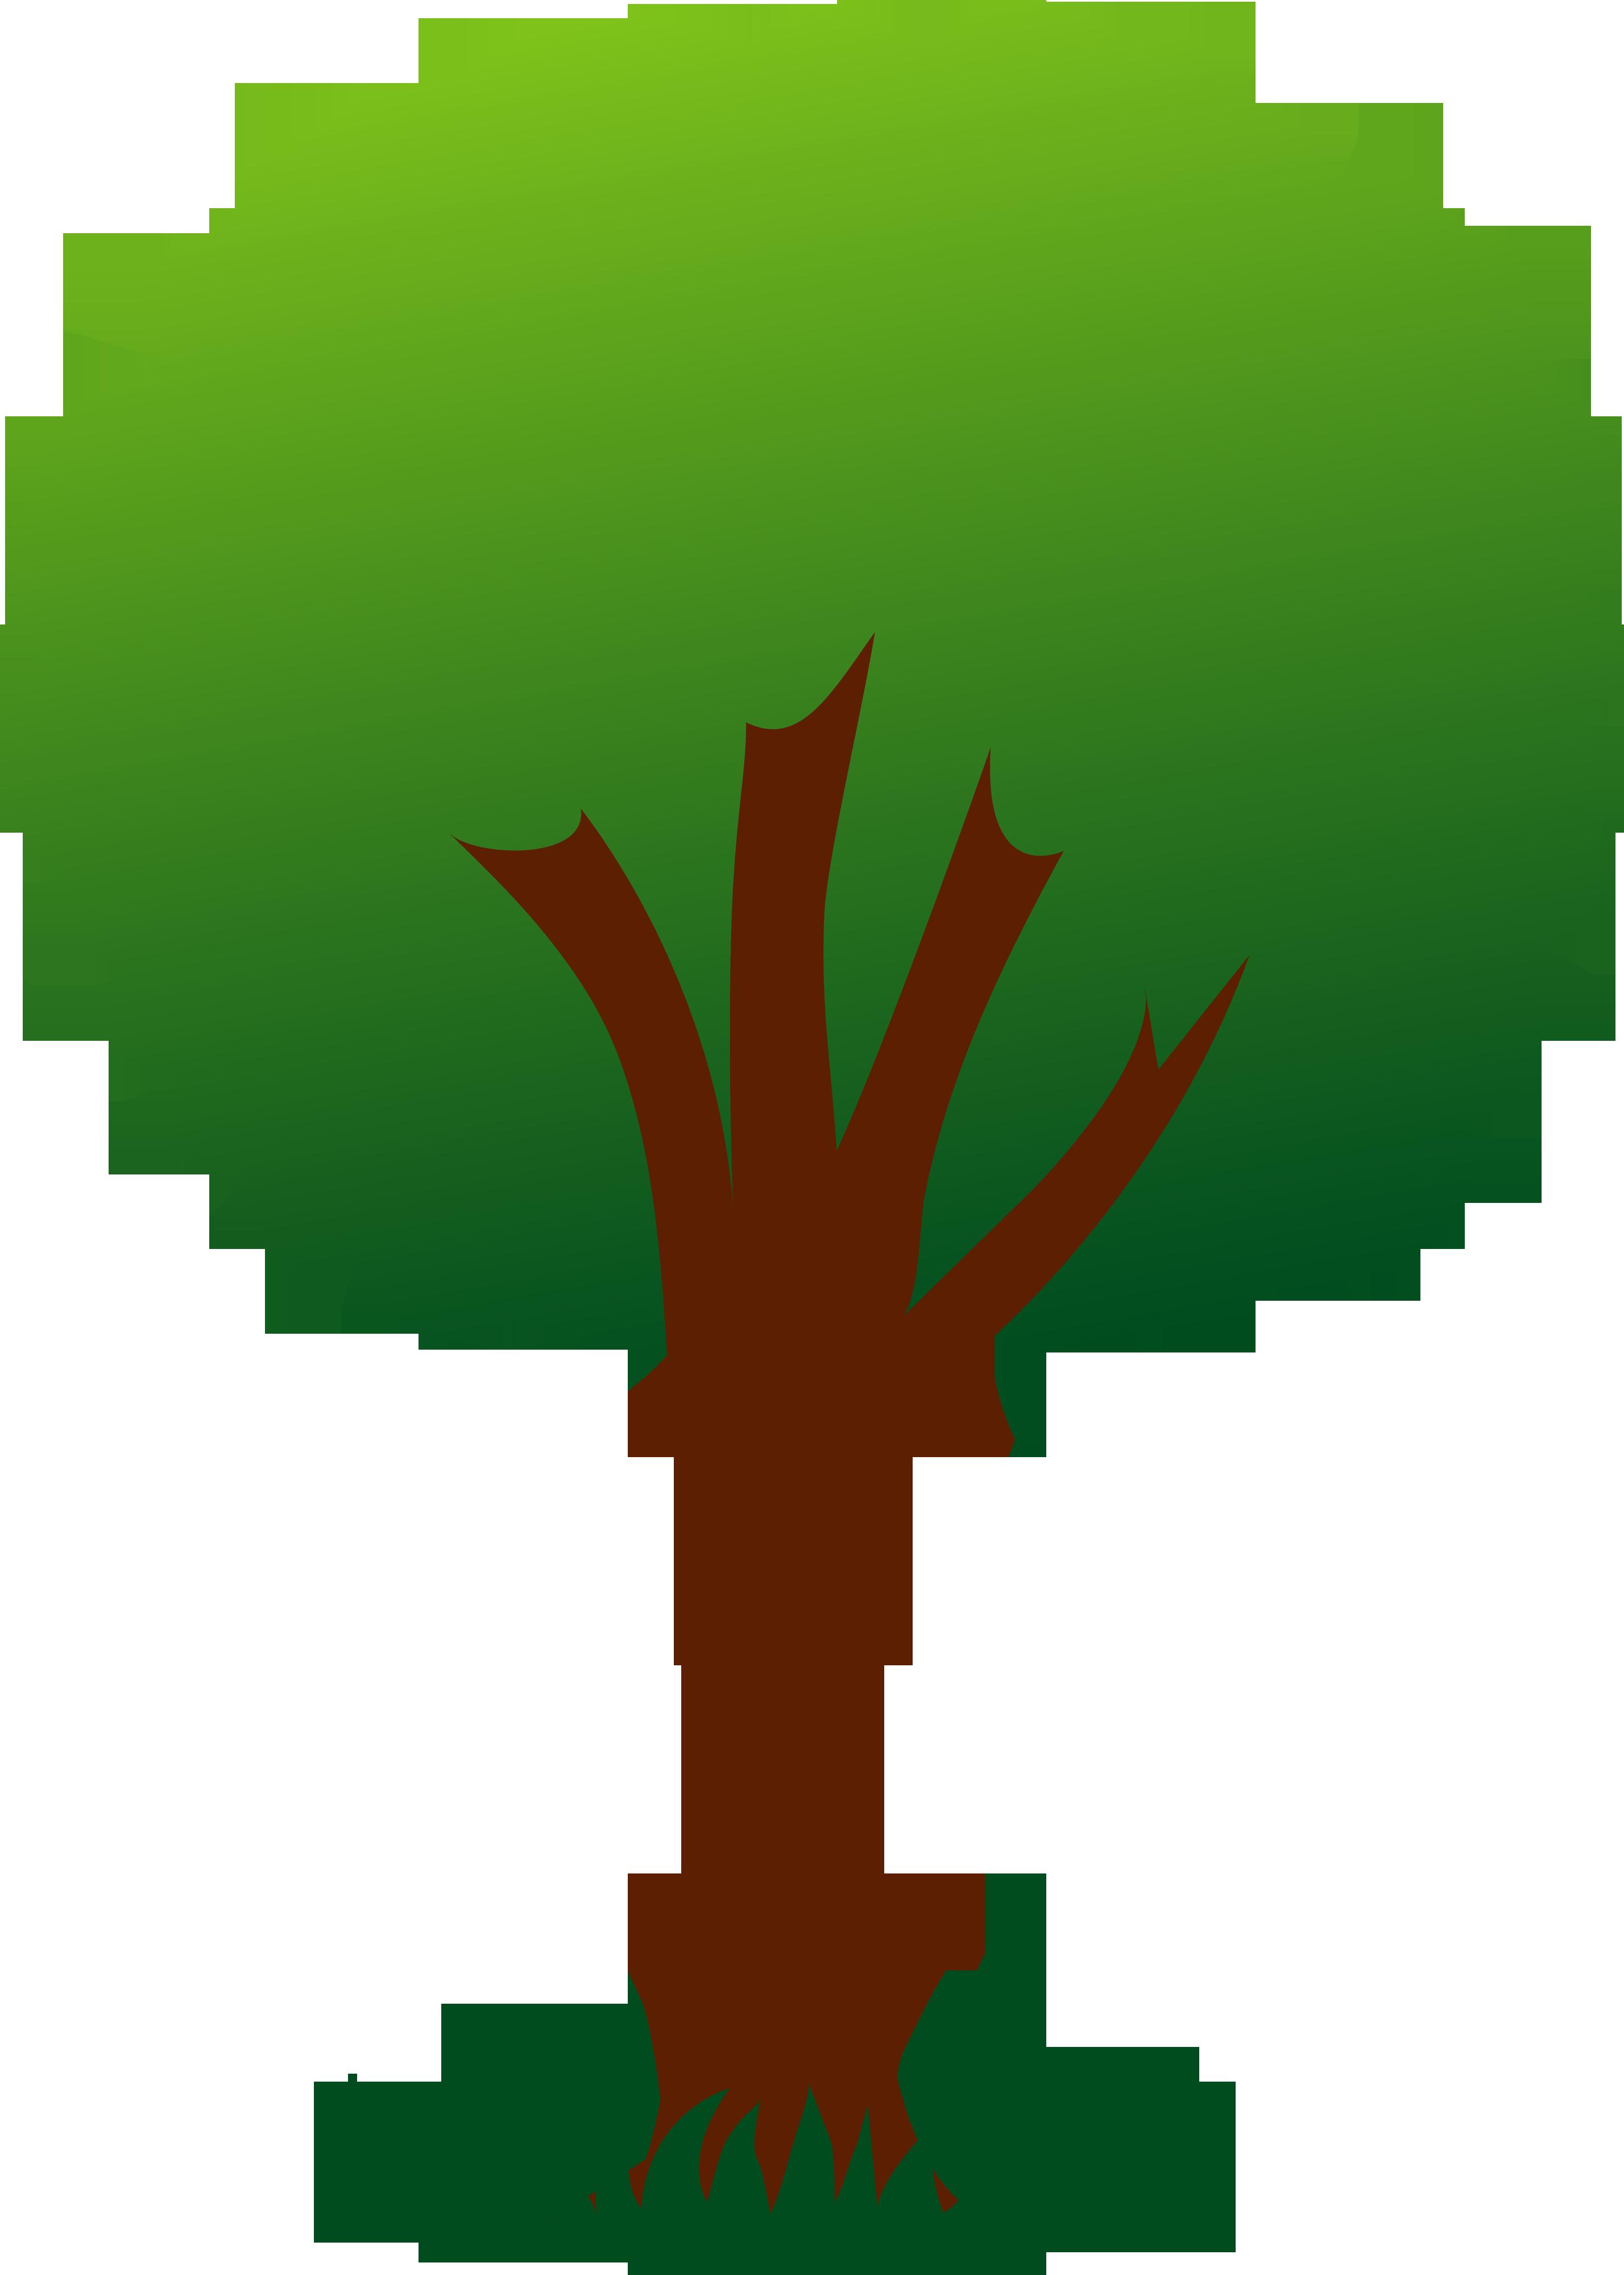 Retro tree clipart clip art vintage tree-Retro tree clipart clip art vintage trees clip art clipart-3